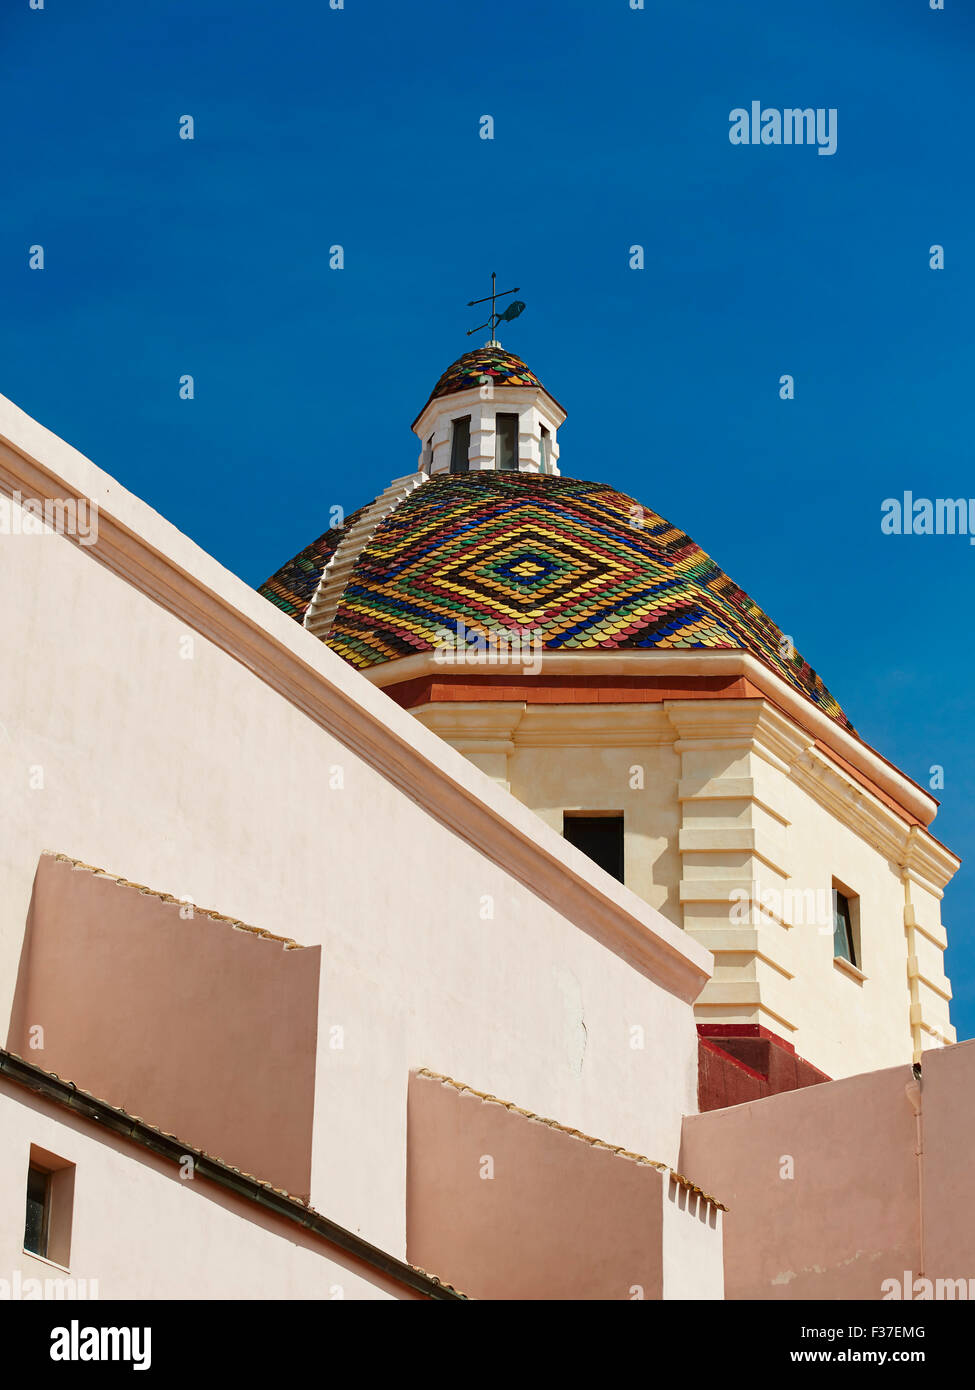 Church of San Michele, Alghero, Sardinia Stock Photo